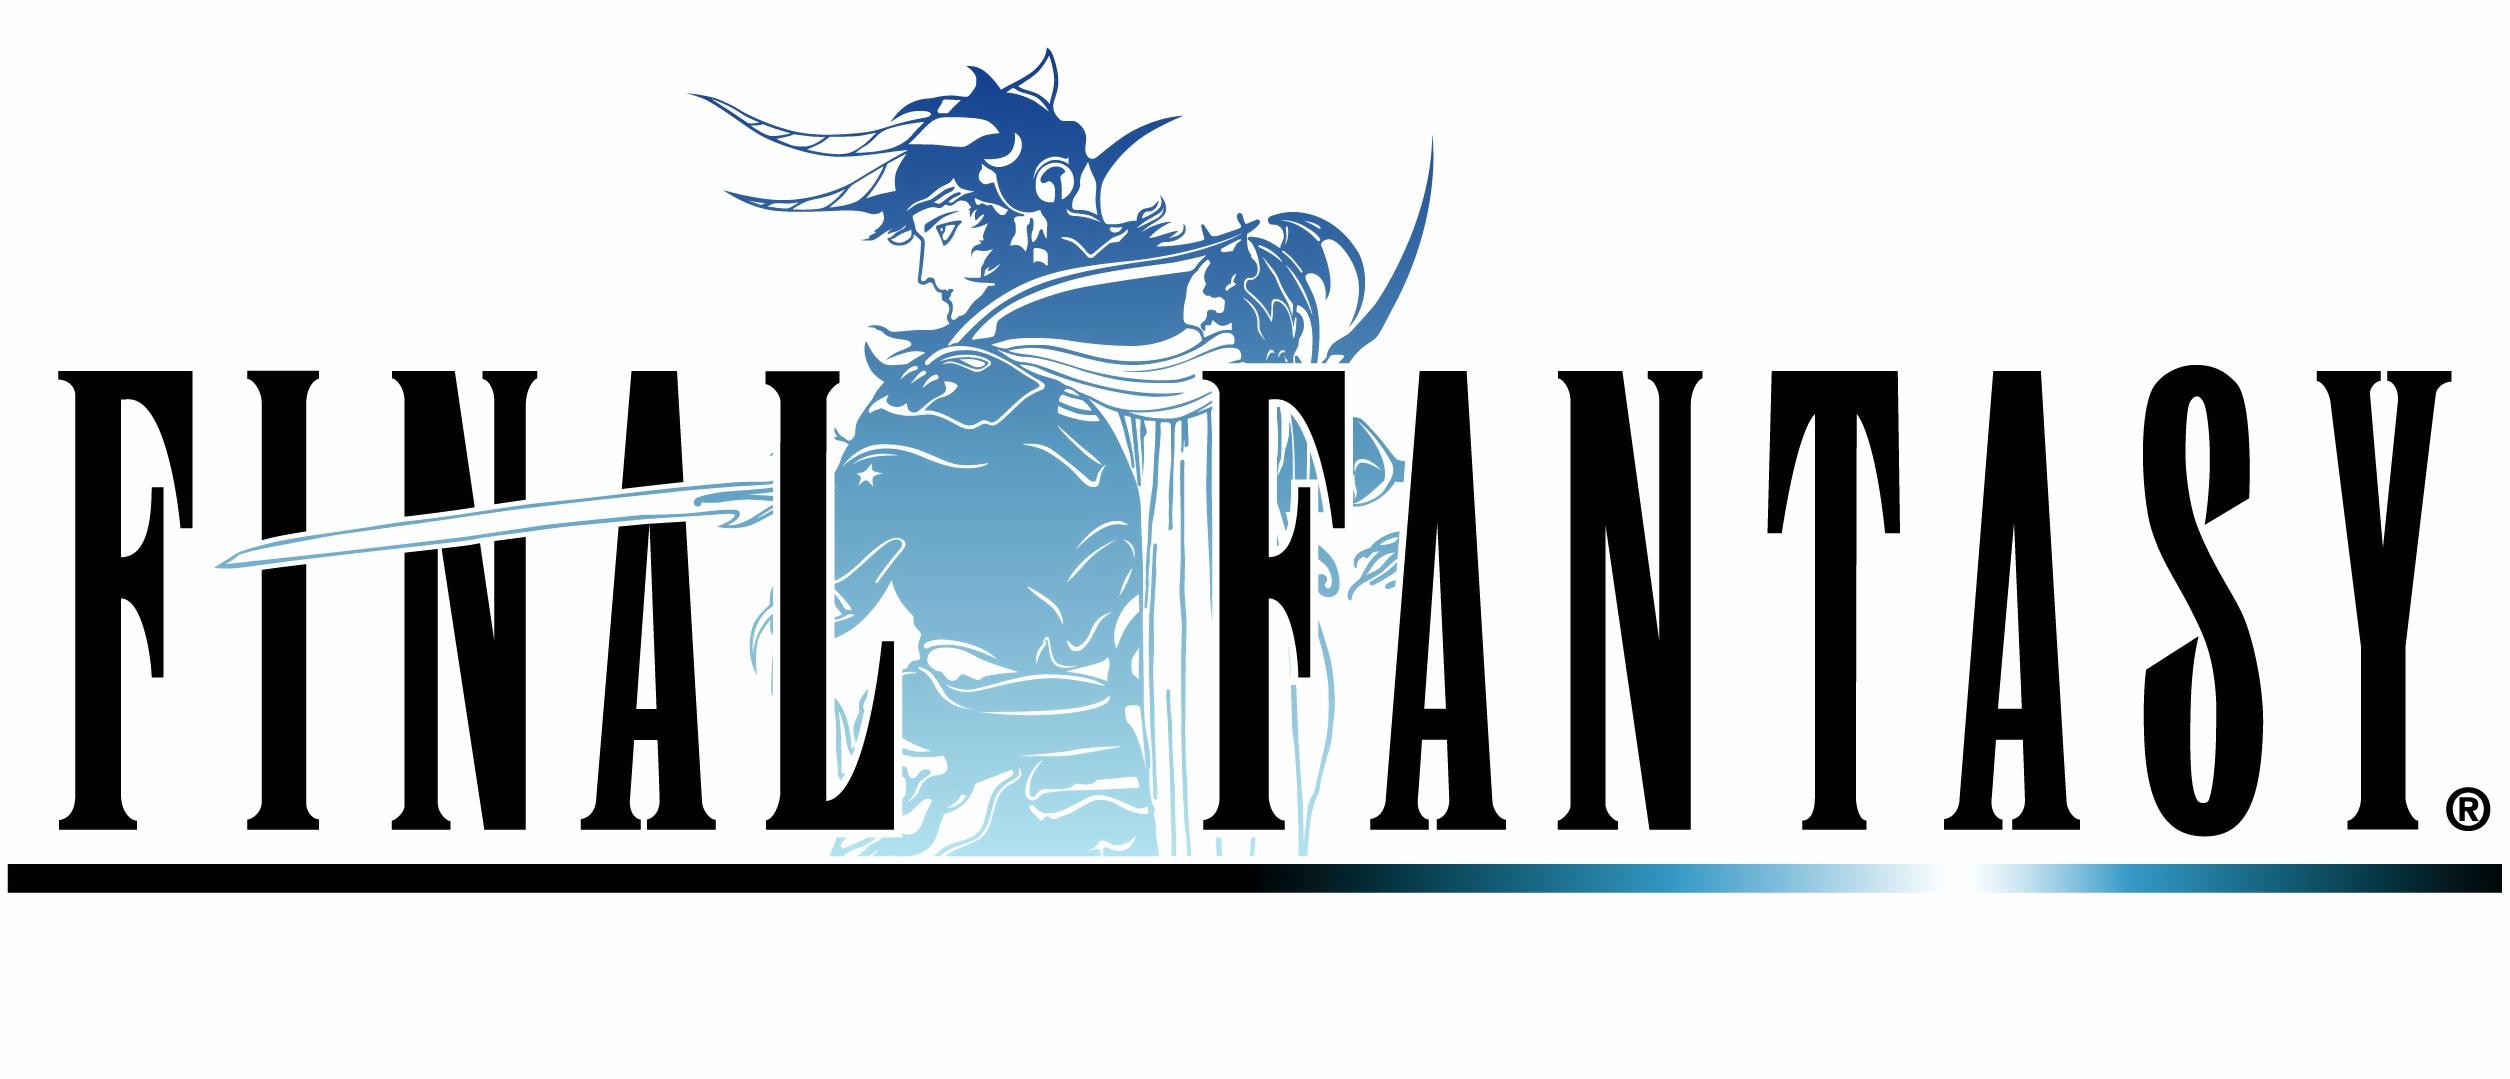 What Killed U0027Final Fantasyu0027-What killed u0027Final Fantasyu0027-21